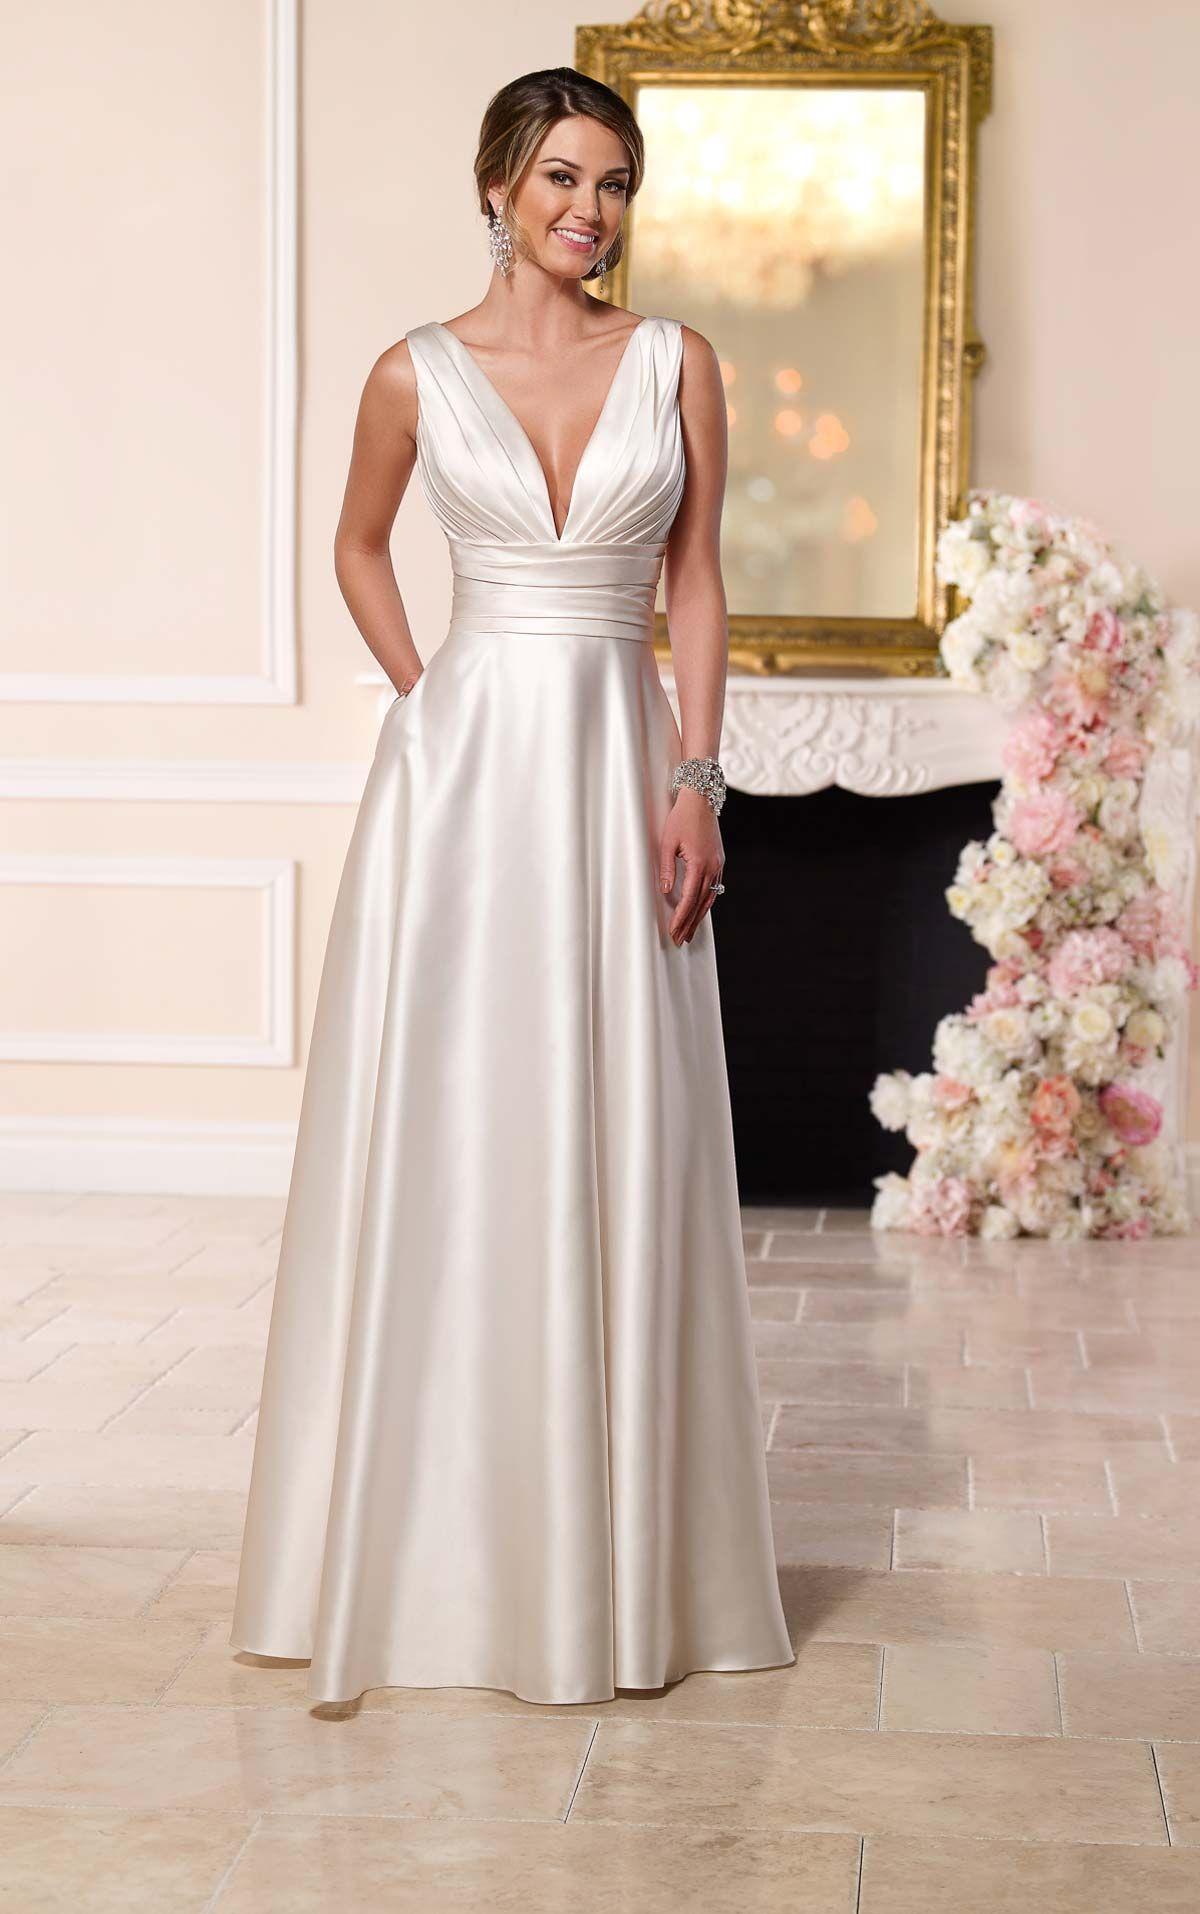 Luxe Satin Wedding Dress | Wedding dresses | Pinterest | Stella york ...